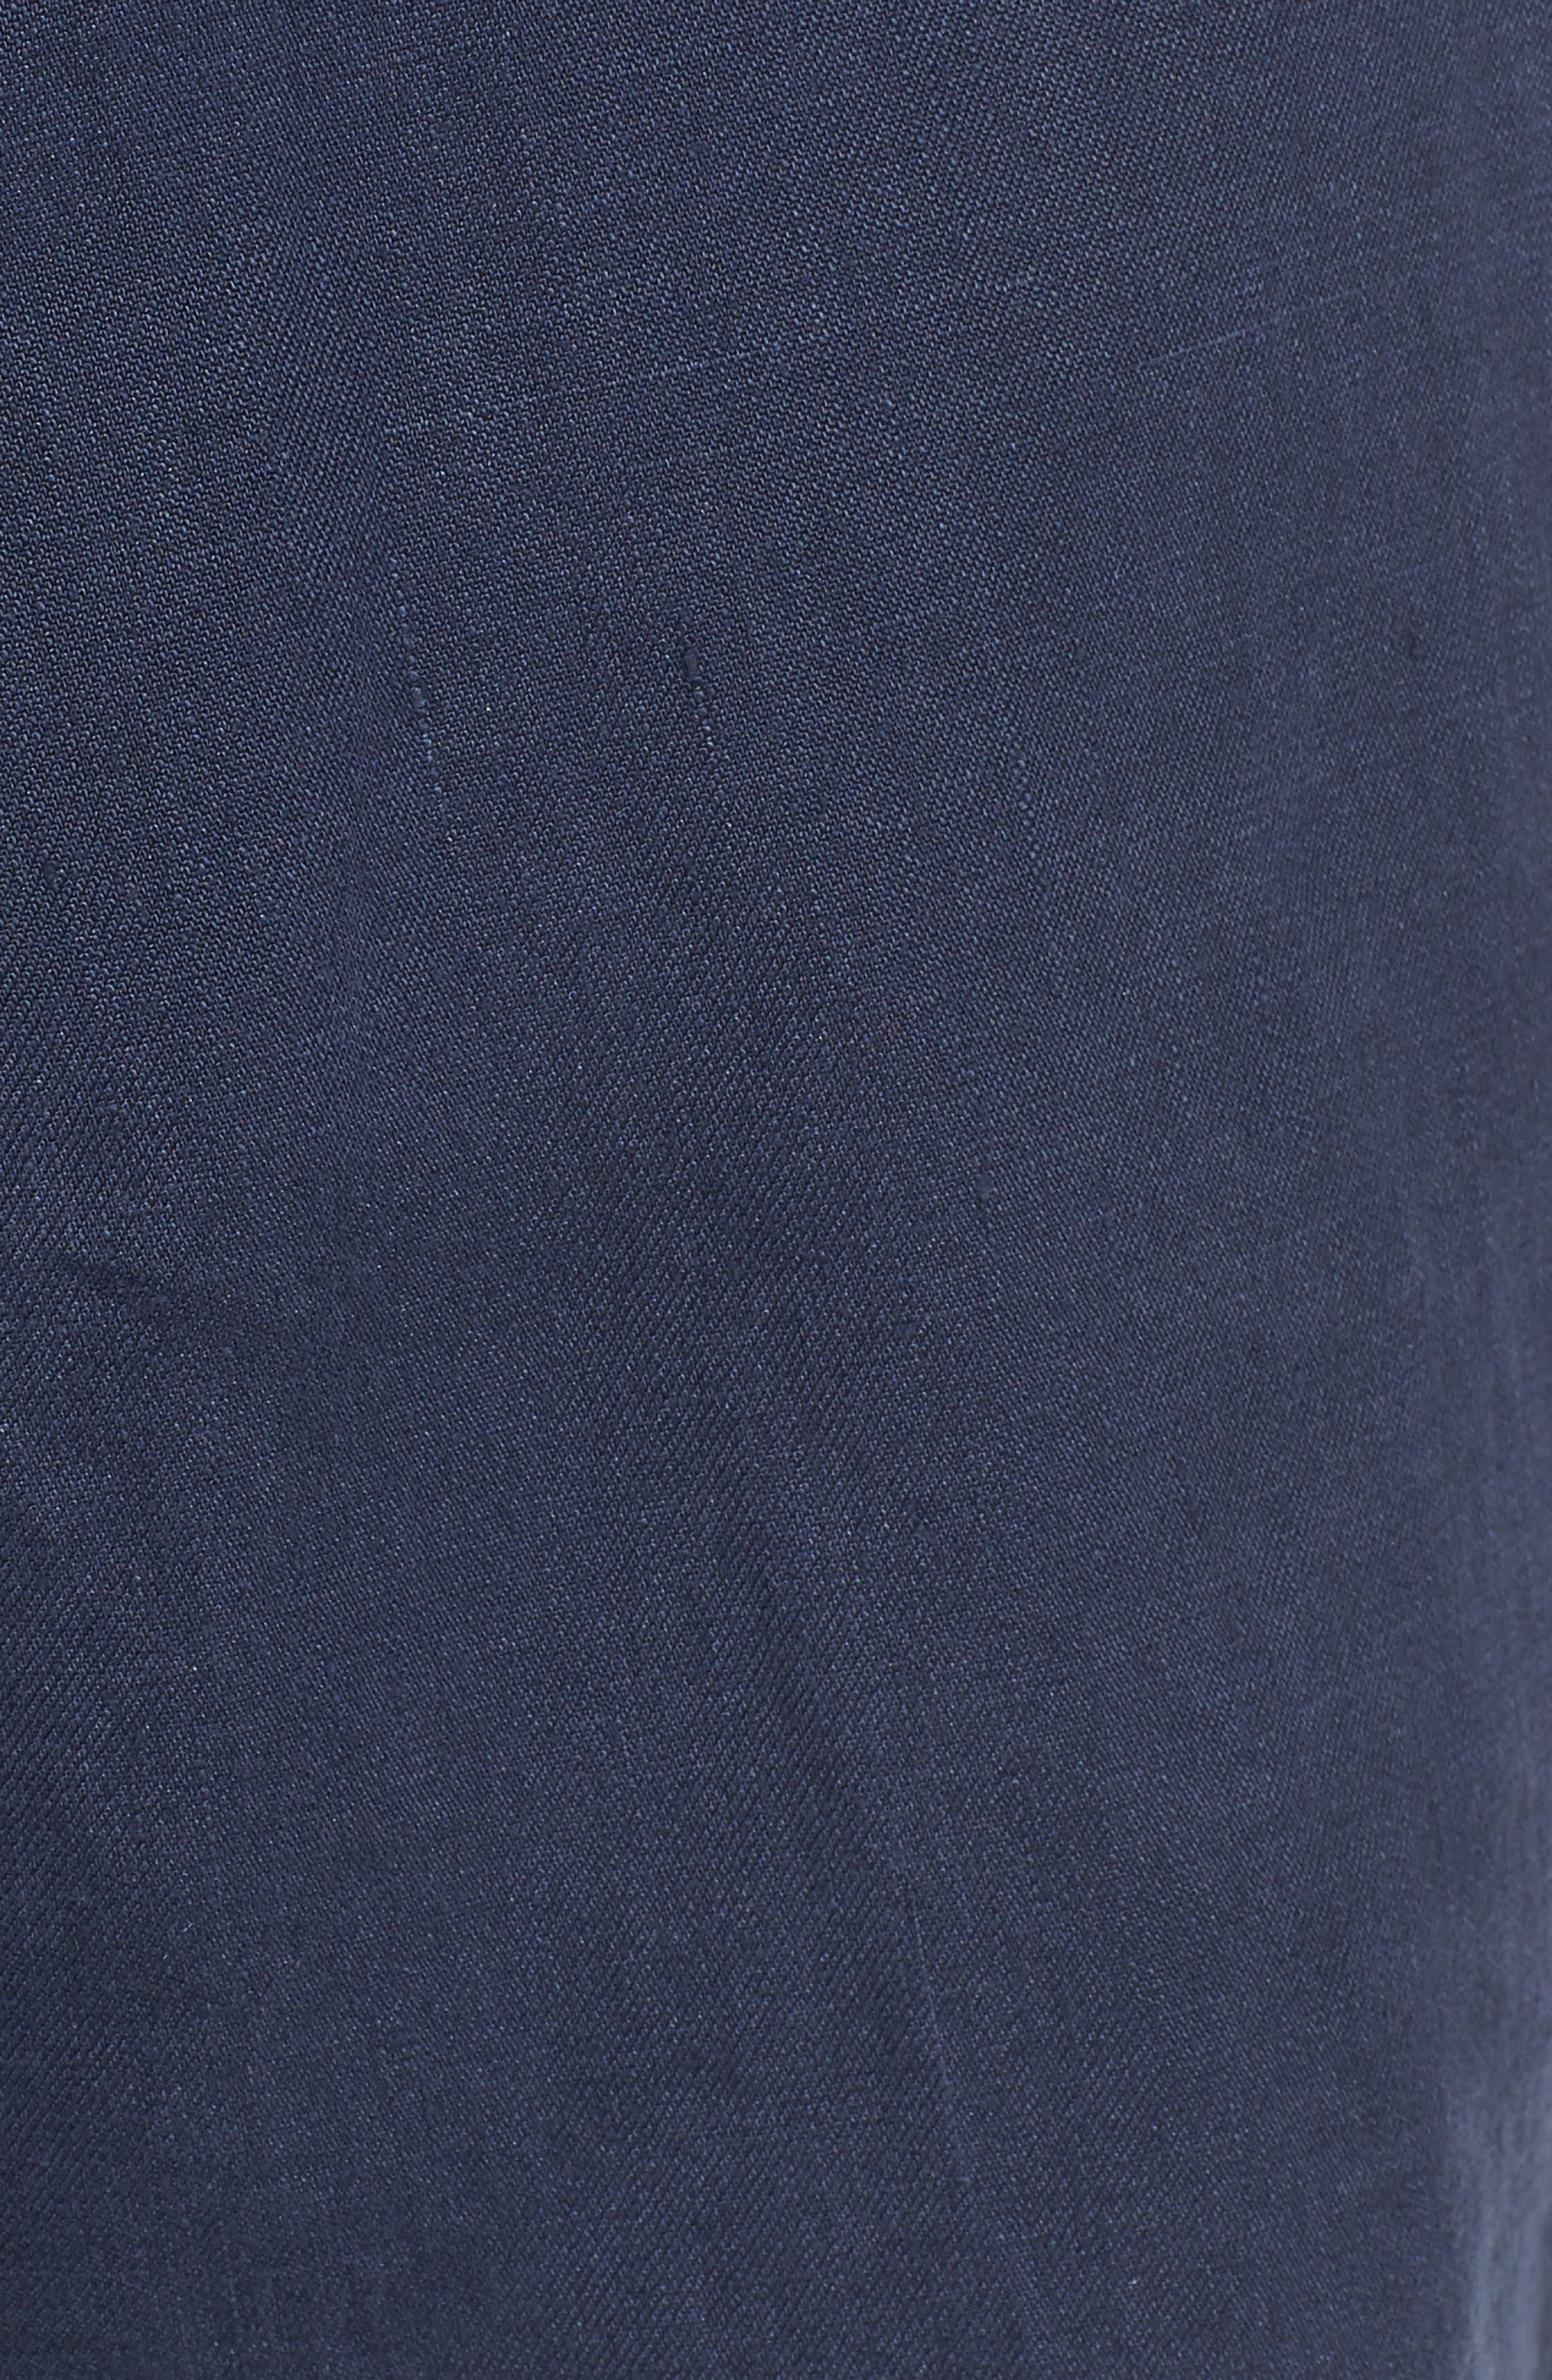 Crigan Linen Shorts,                             Alternate thumbnail 25, color,